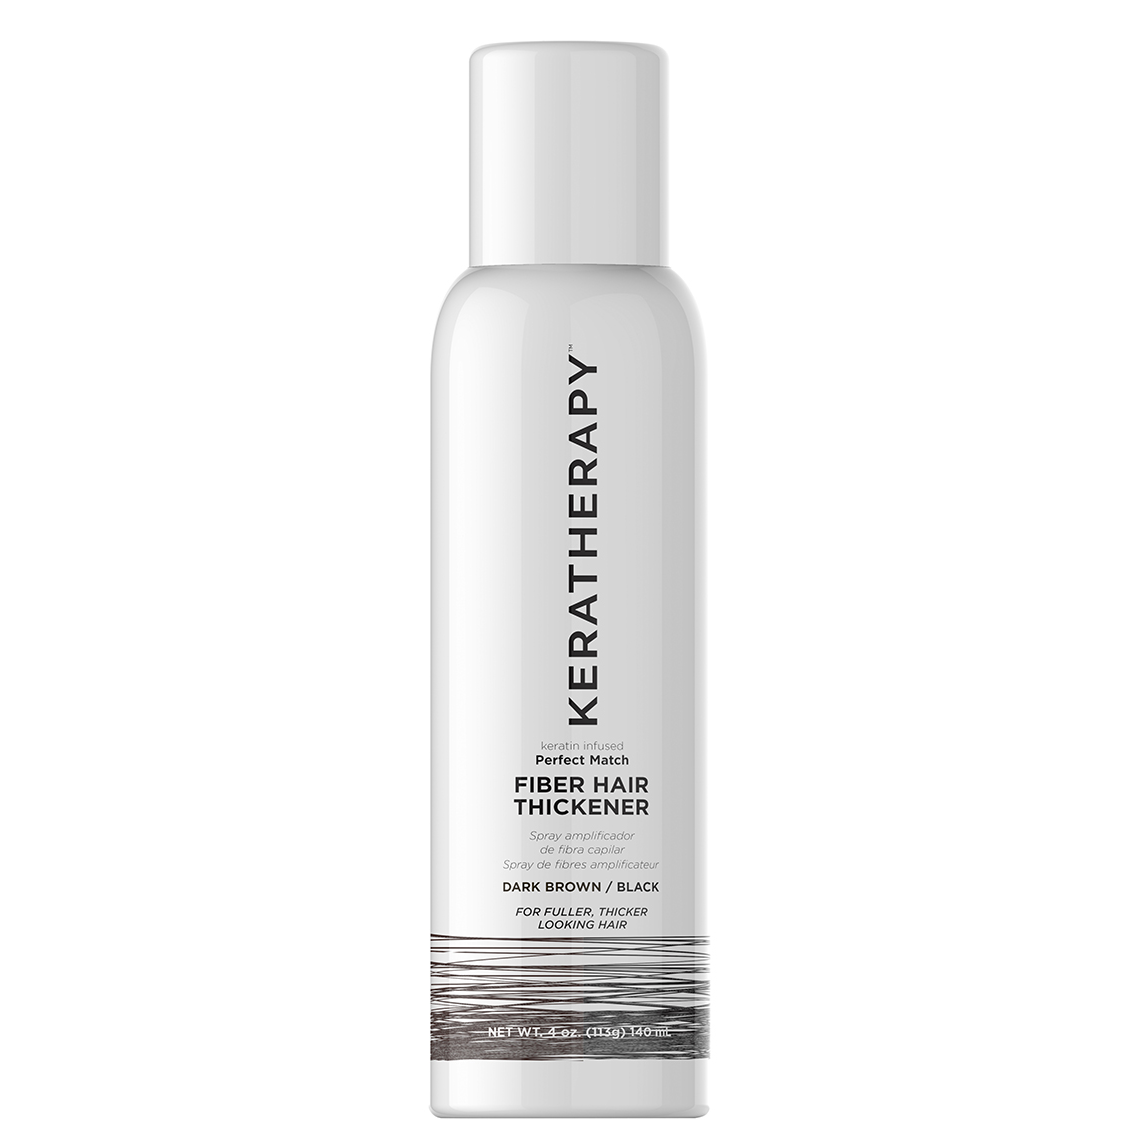 Keratherapy Dark brown/Black Fibre Hair Thickening Spray / Hair Thickener 140ml